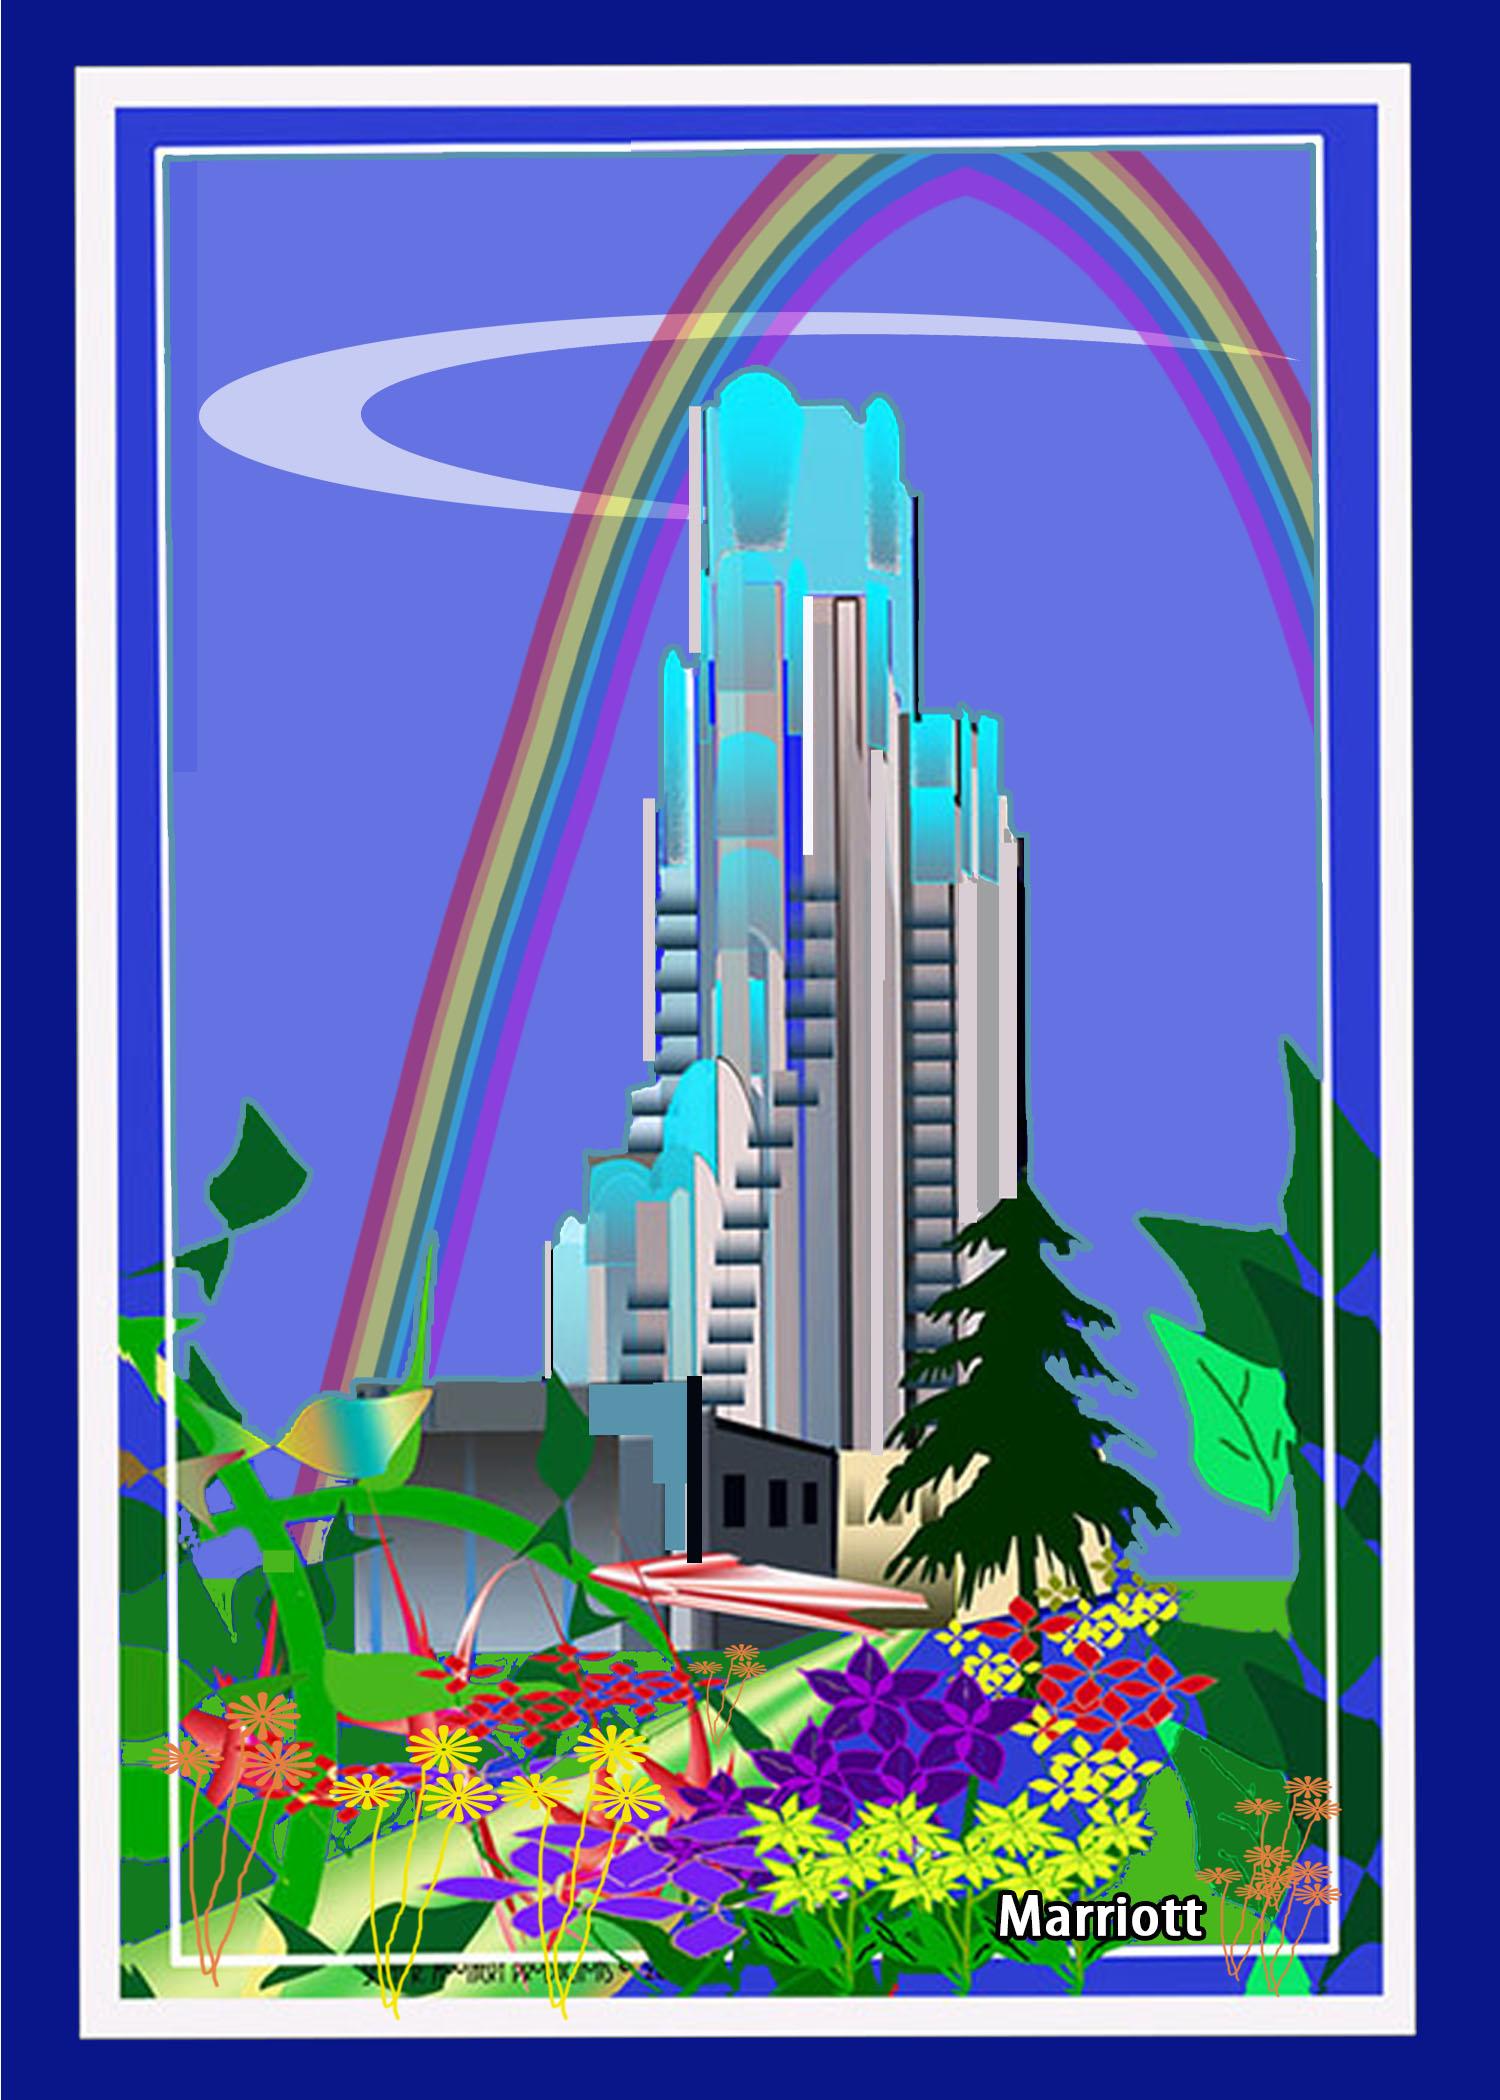 Marriott Hotel w Rainbow